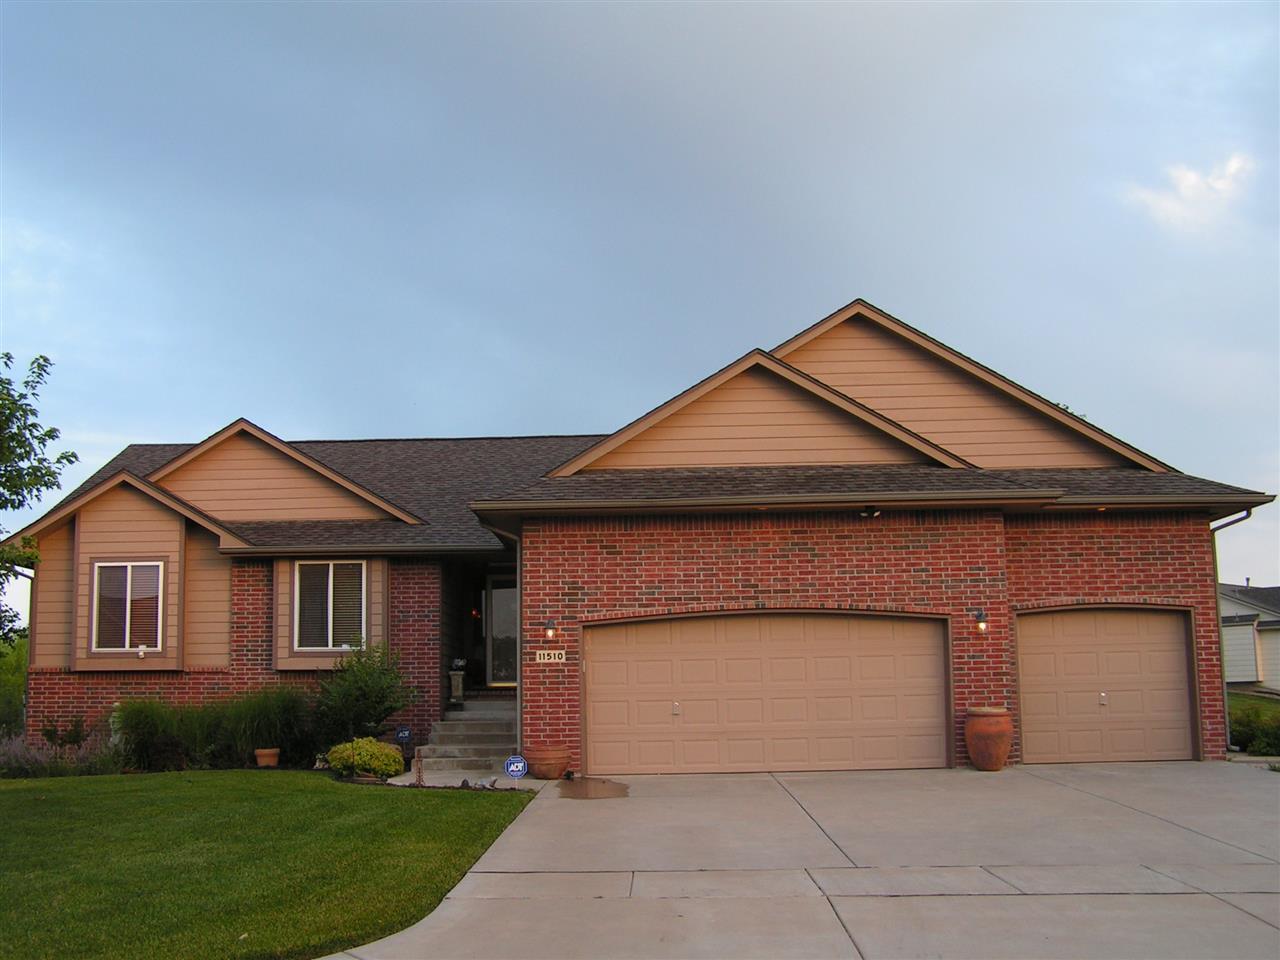 11510 E Pine Meadow Ct., Wichita, KS 67208